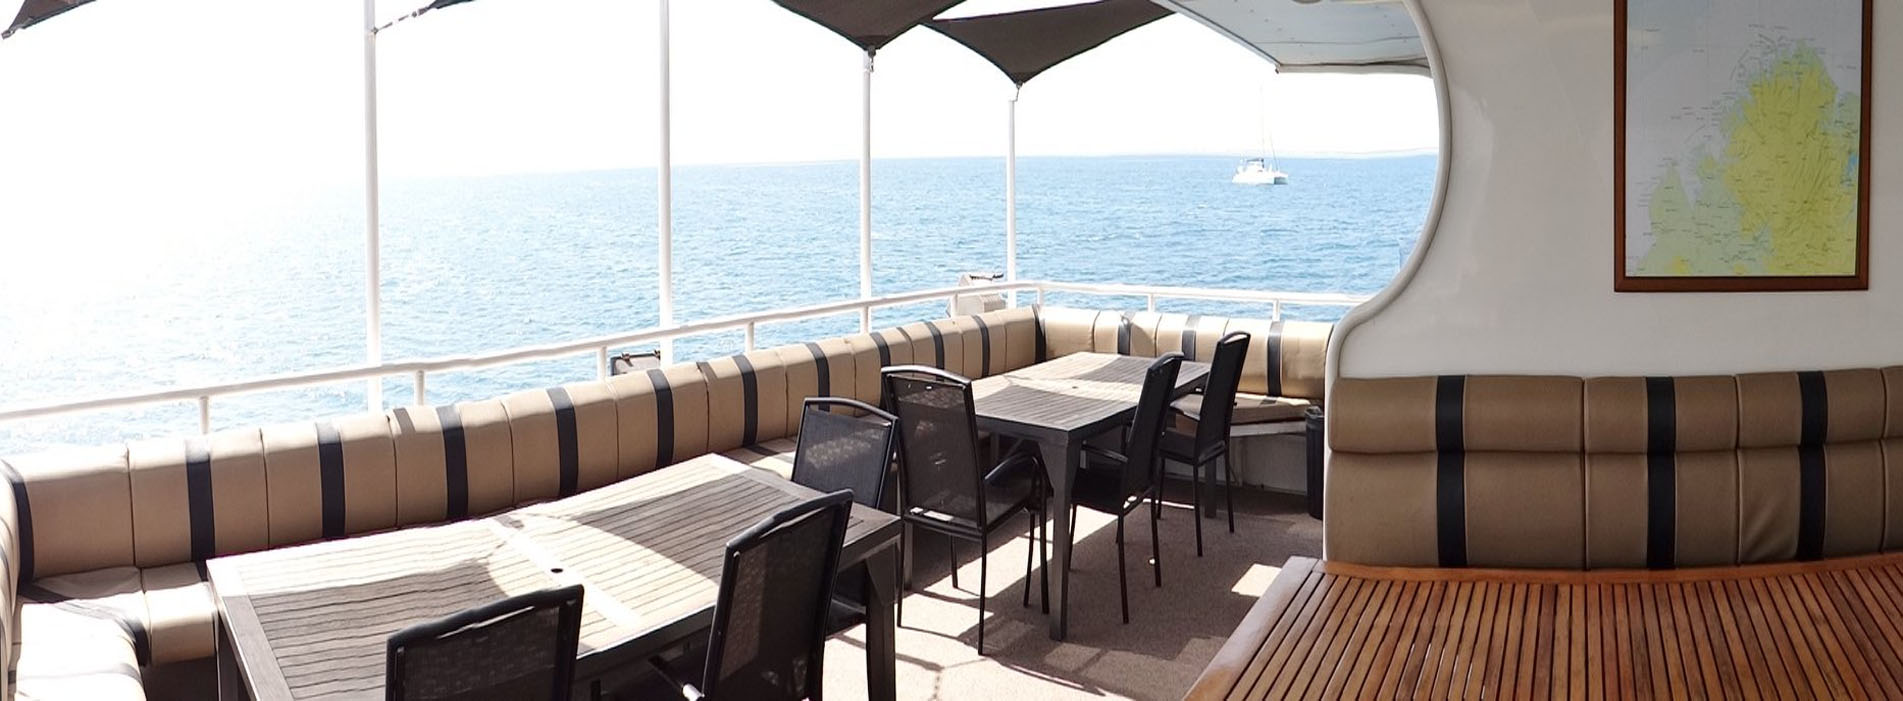 ODYSSEY-boat-charters-perth-wa-upper-deck-bar-area